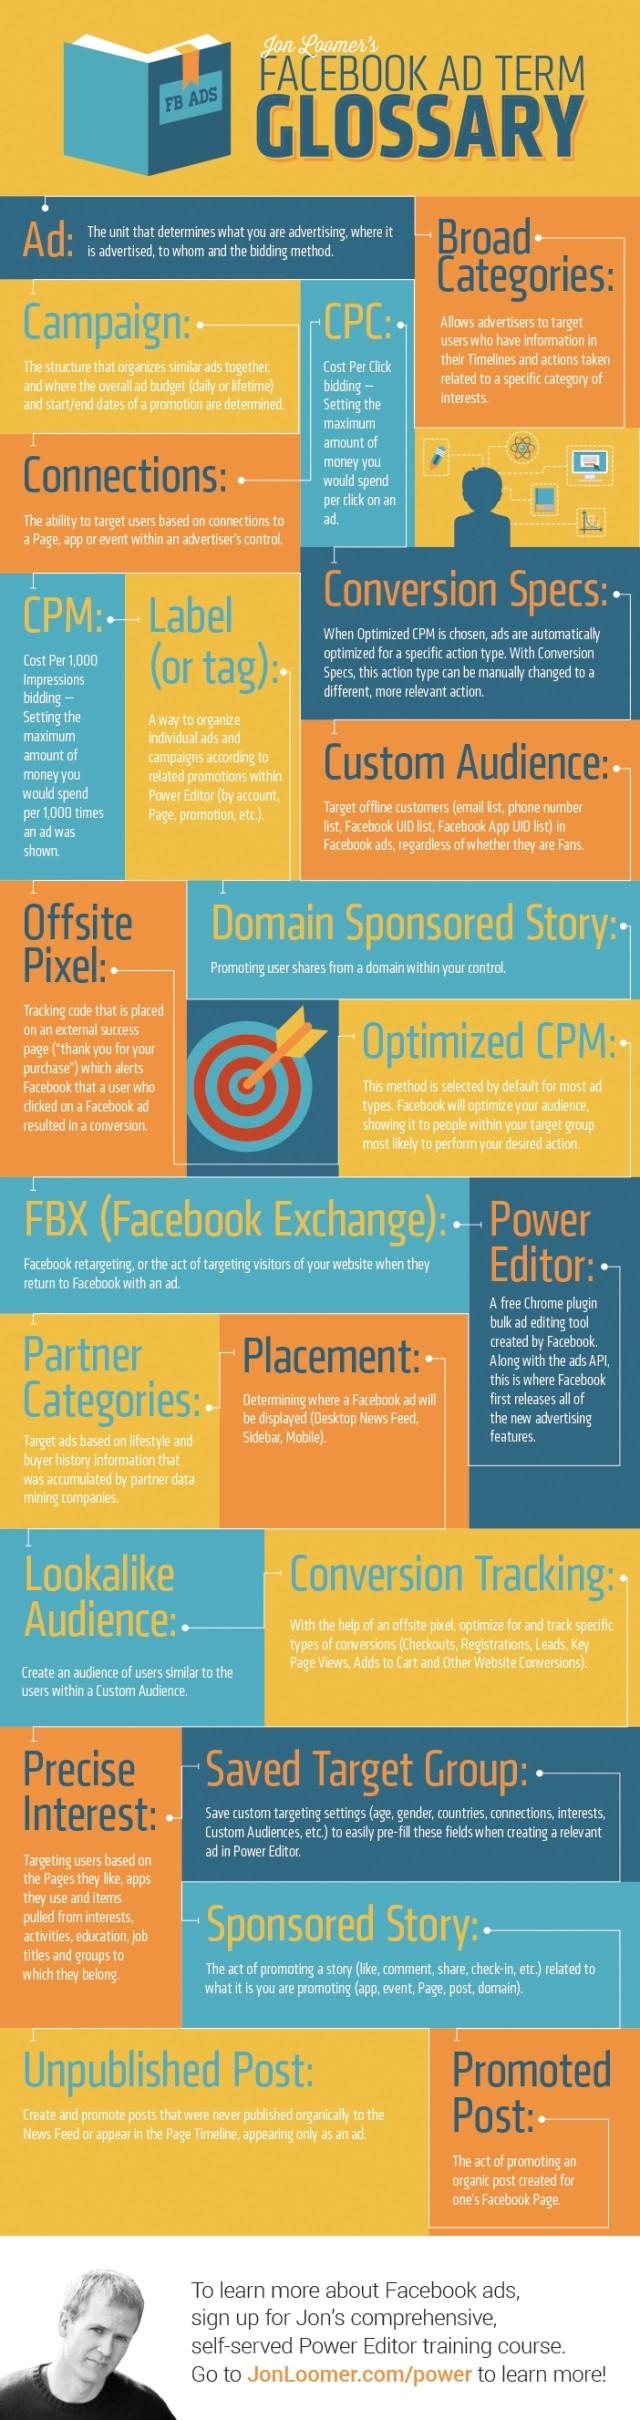 JonLoomerFacebookAdTermGlossaryInfographic